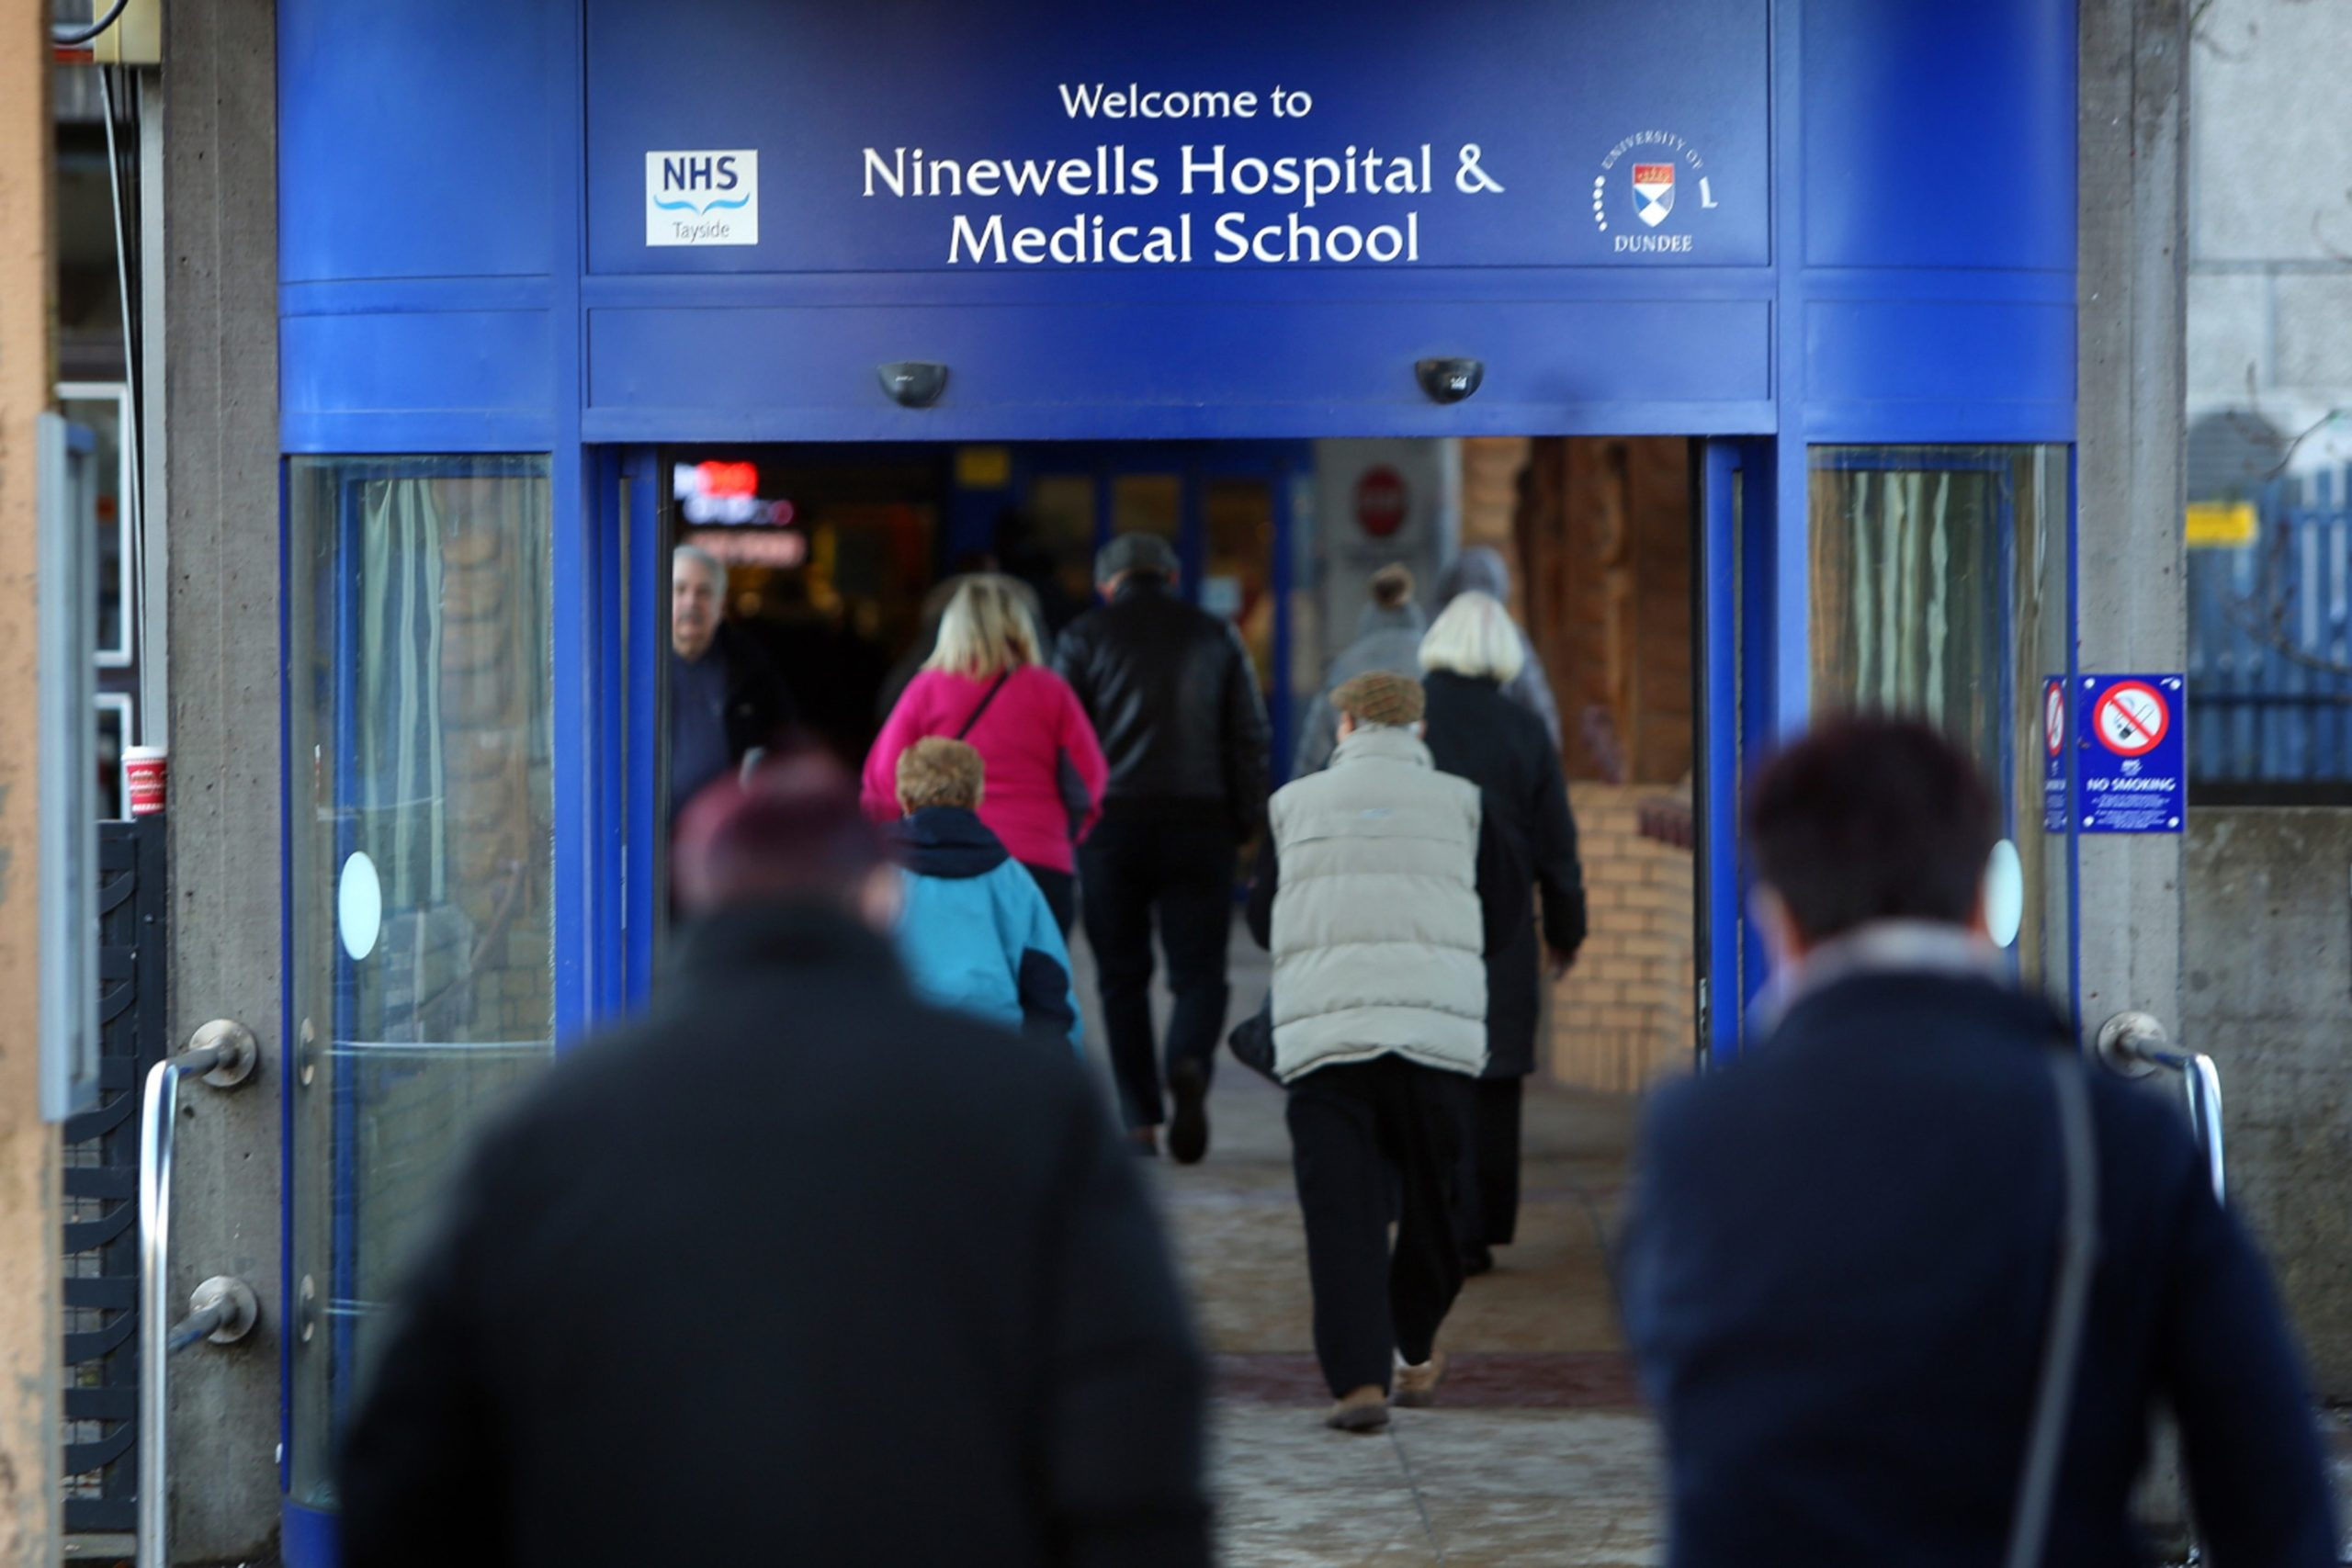 The medical school, based in Ninewells Hospital